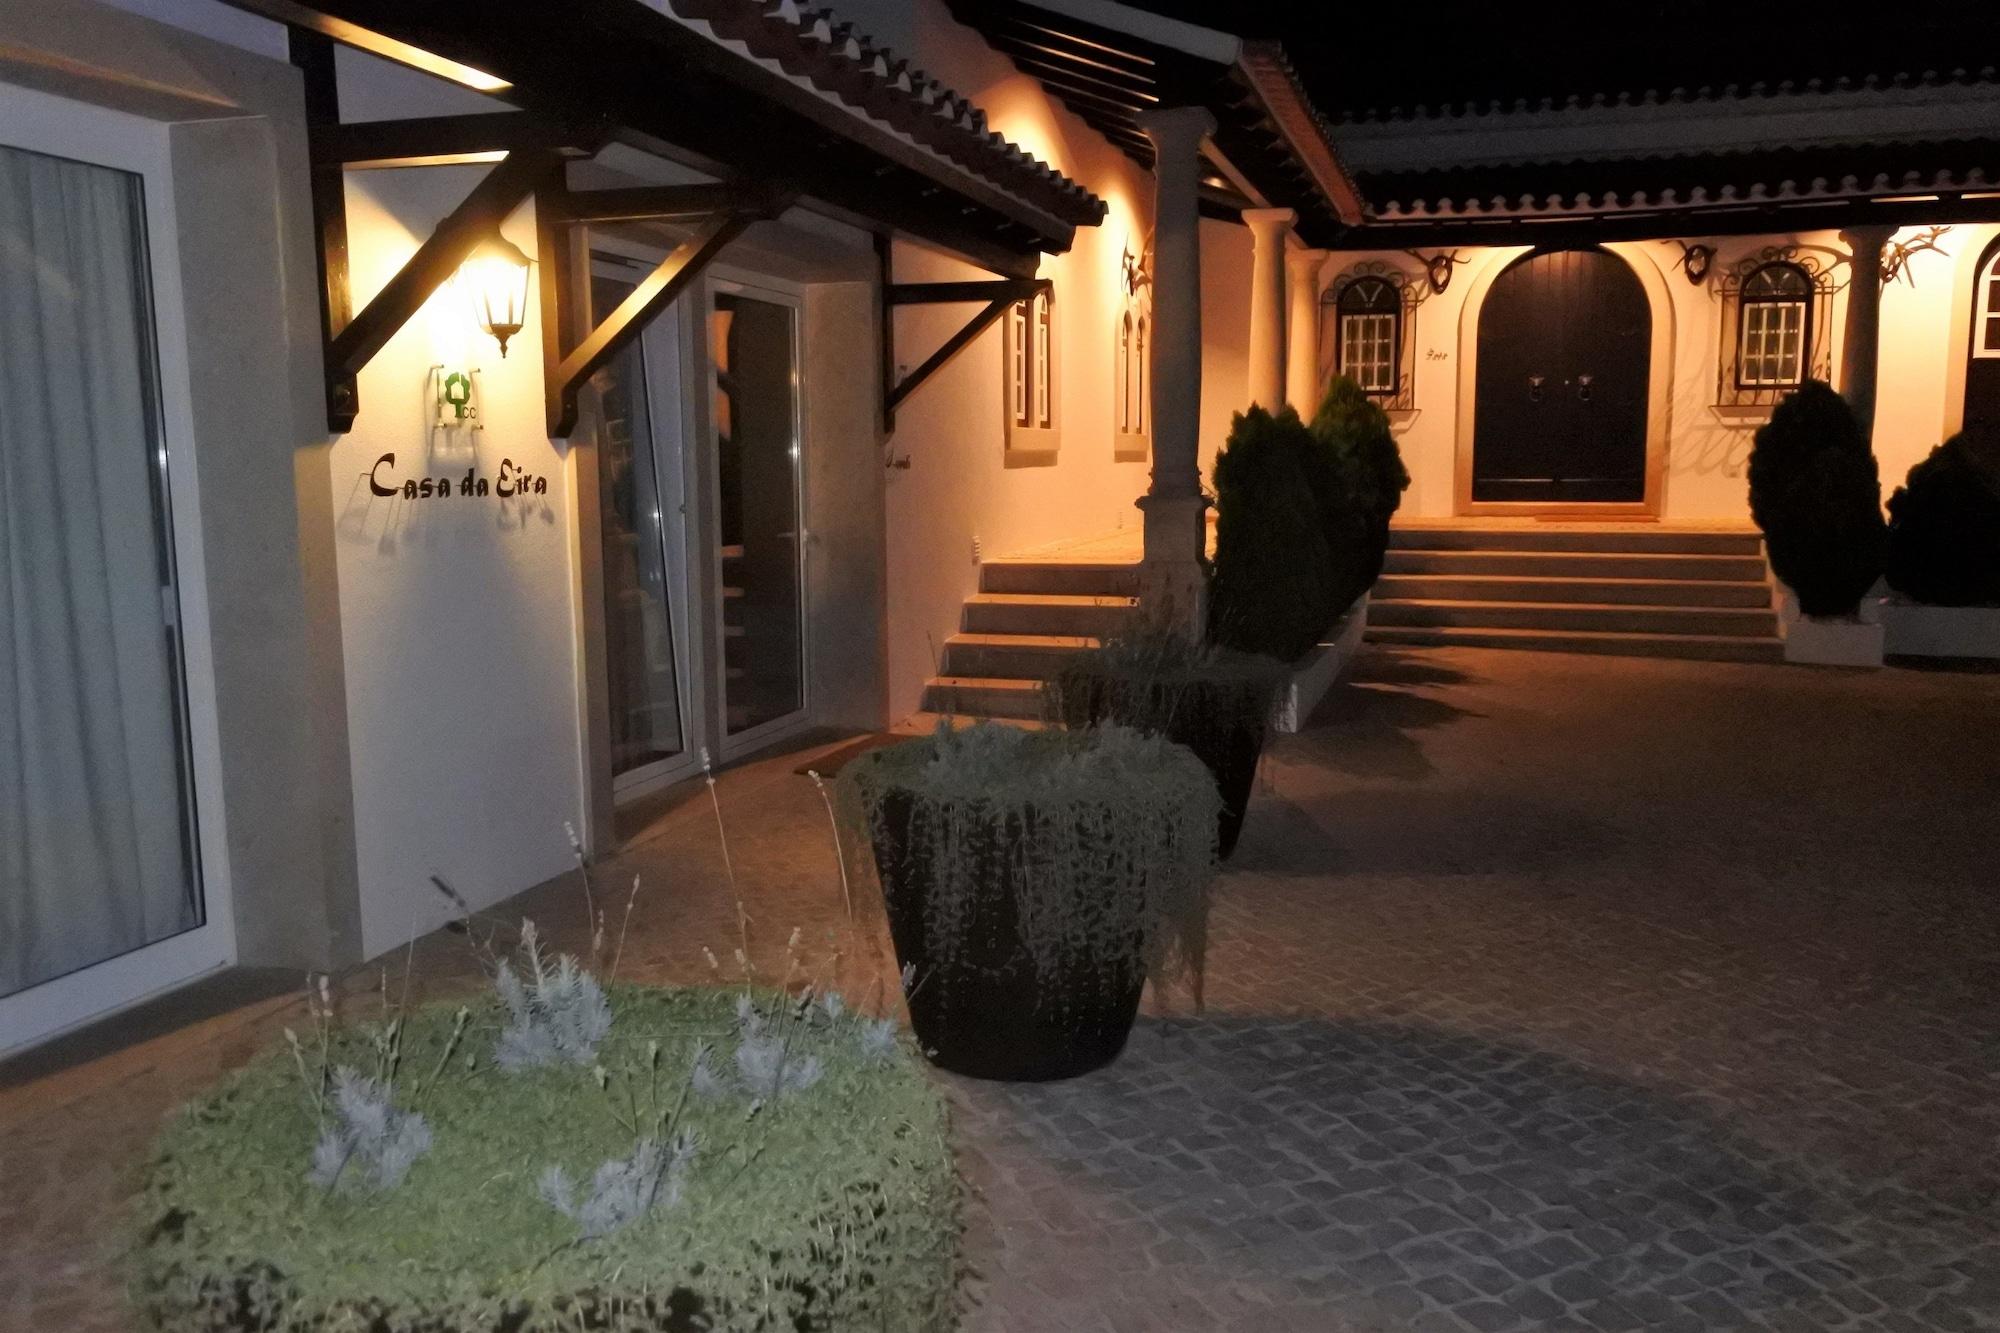 Casa da Eira, Cadaval